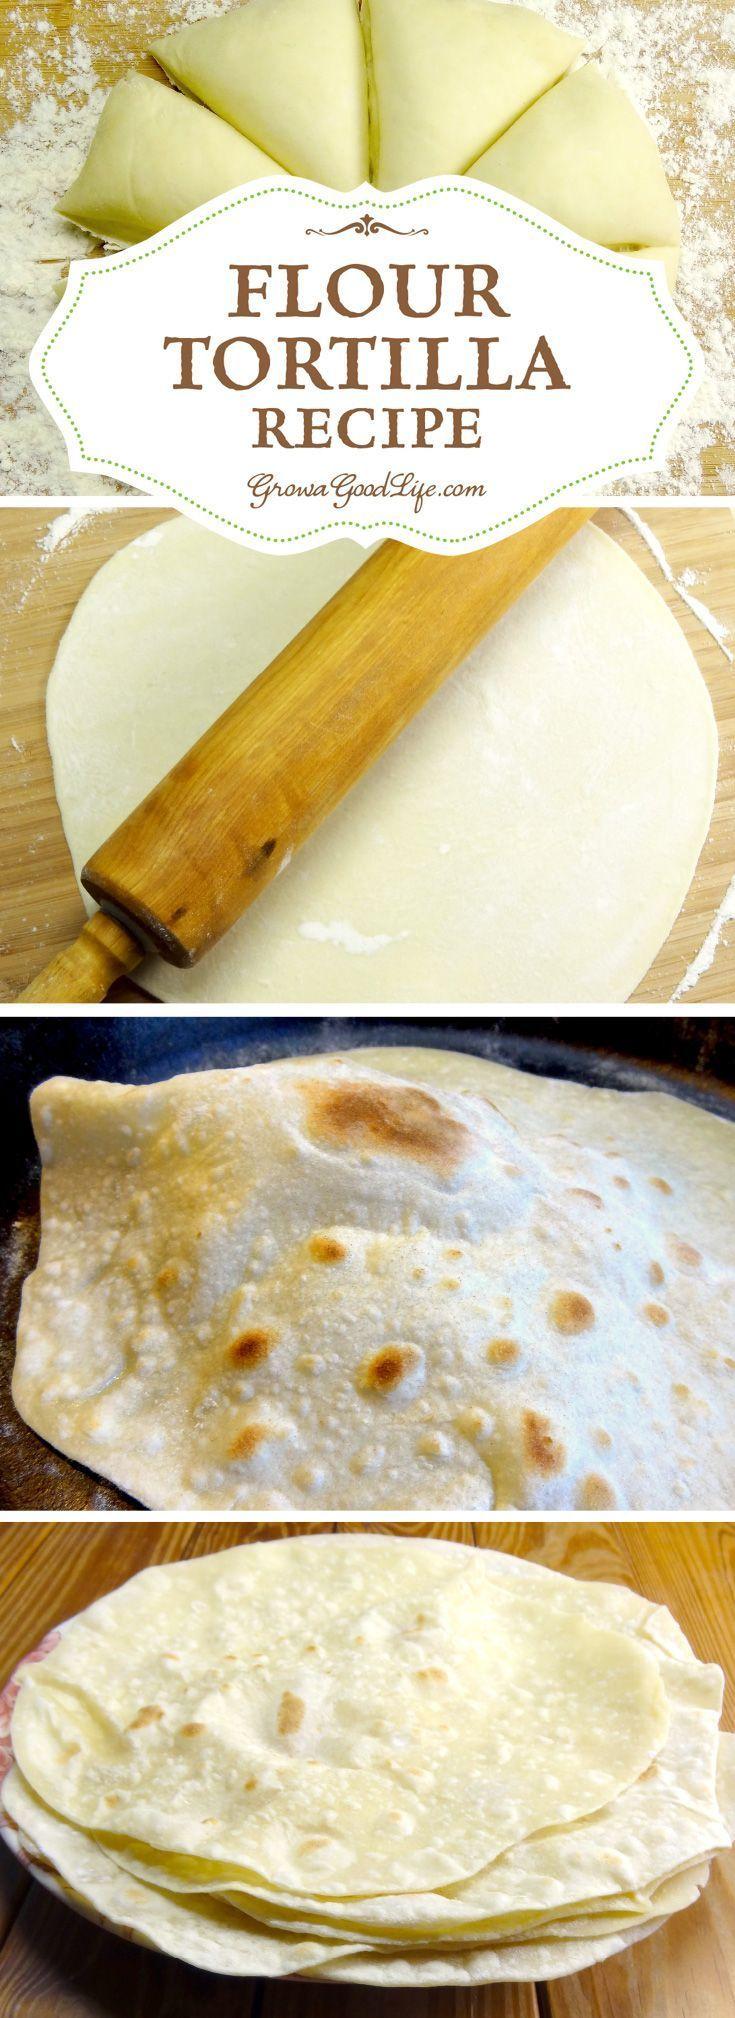 how to make tostada shells with flour tortillas